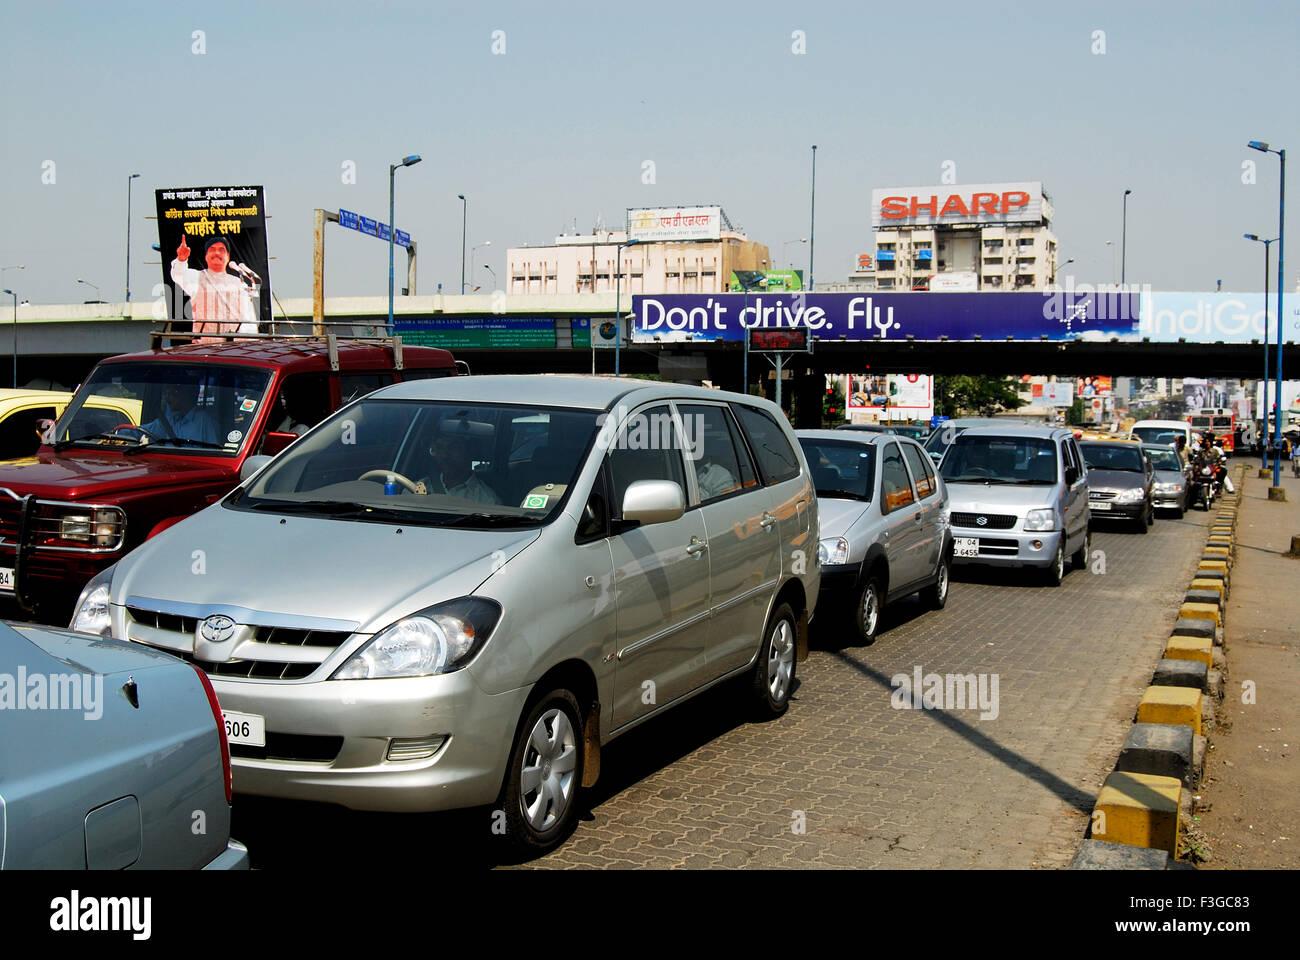 Traffic Jam Bombay Street Funny Ad Top to Solve Problem Stating Do Not Drive but Fly ; Bombay Mumbai Maharashtra - Stock Image